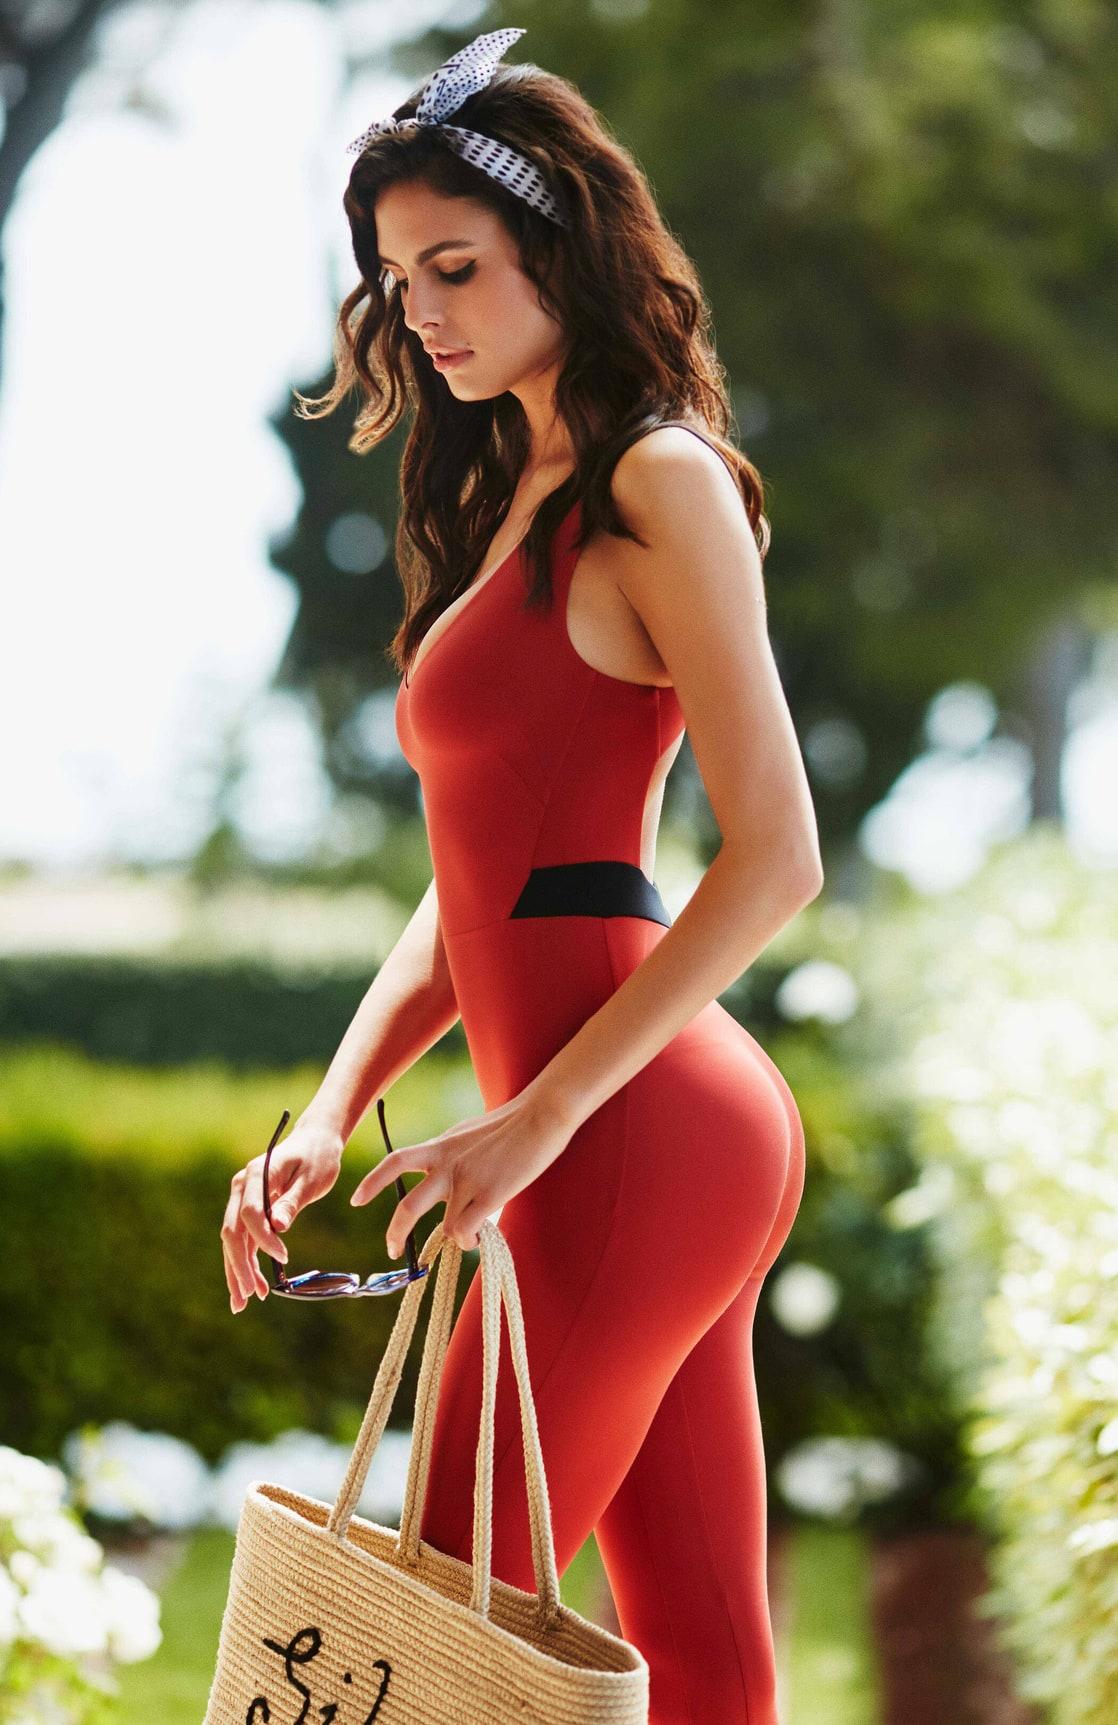 Bojana Krsmanovic Pictures. Hotness Rating = 9.59/10